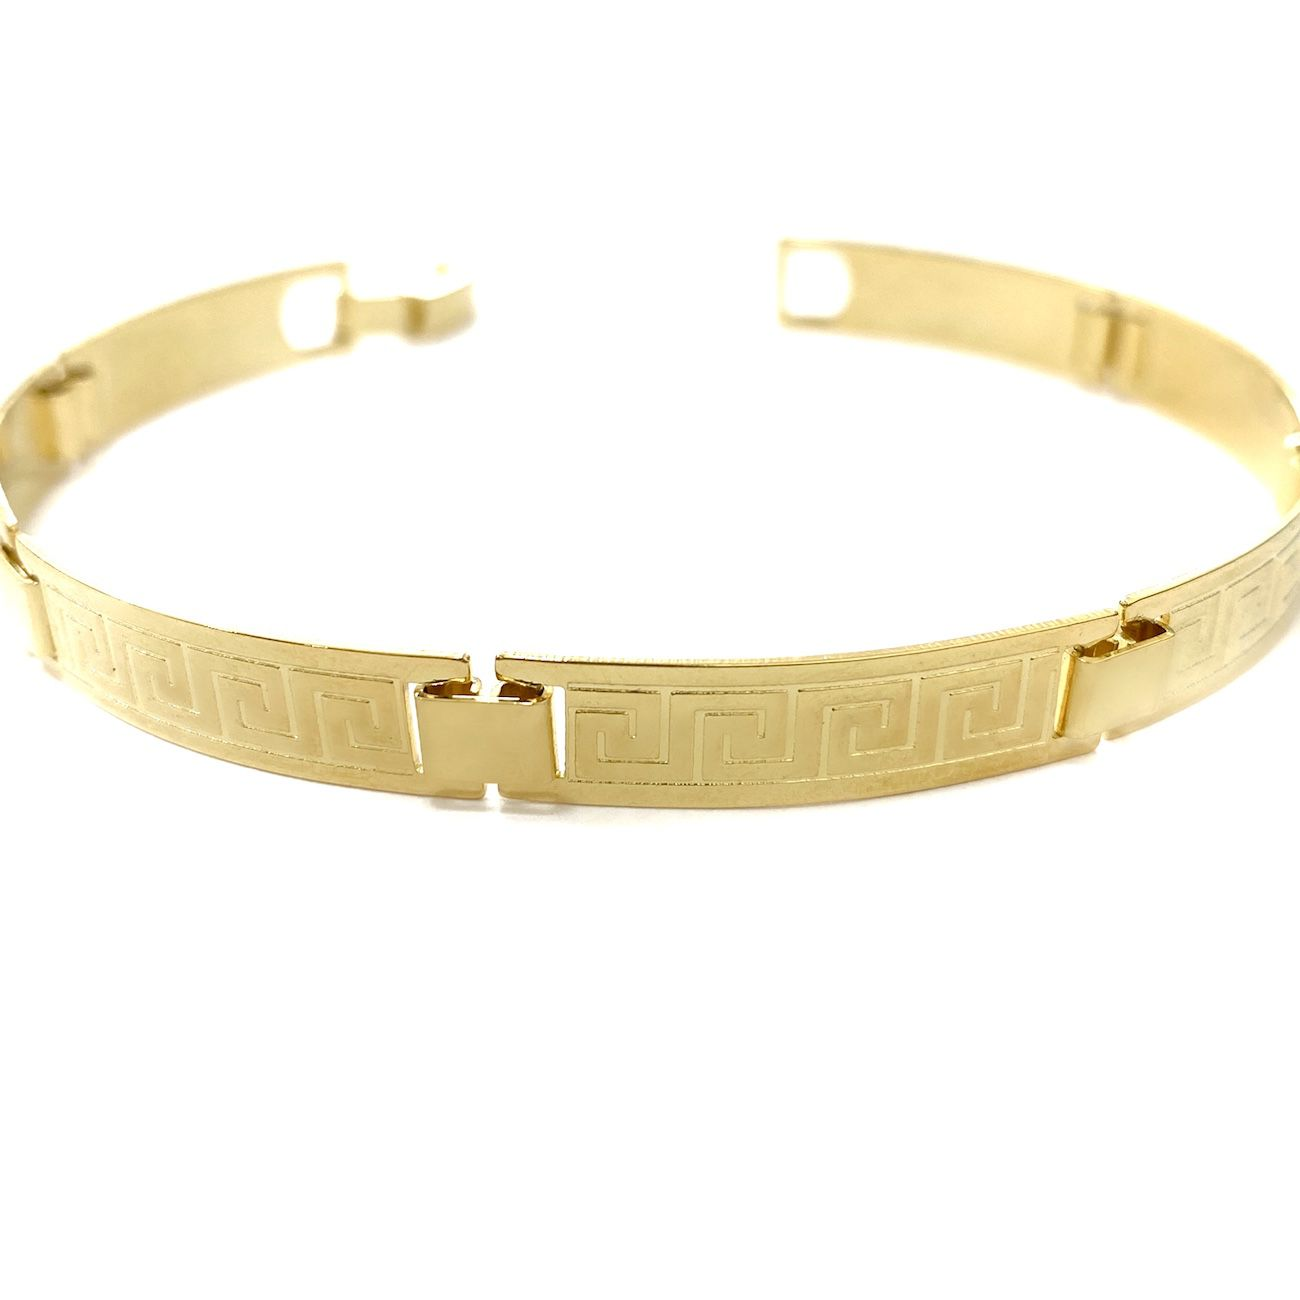 Bracelete Medusa 7mm 11g (Banho Ouro 24k)